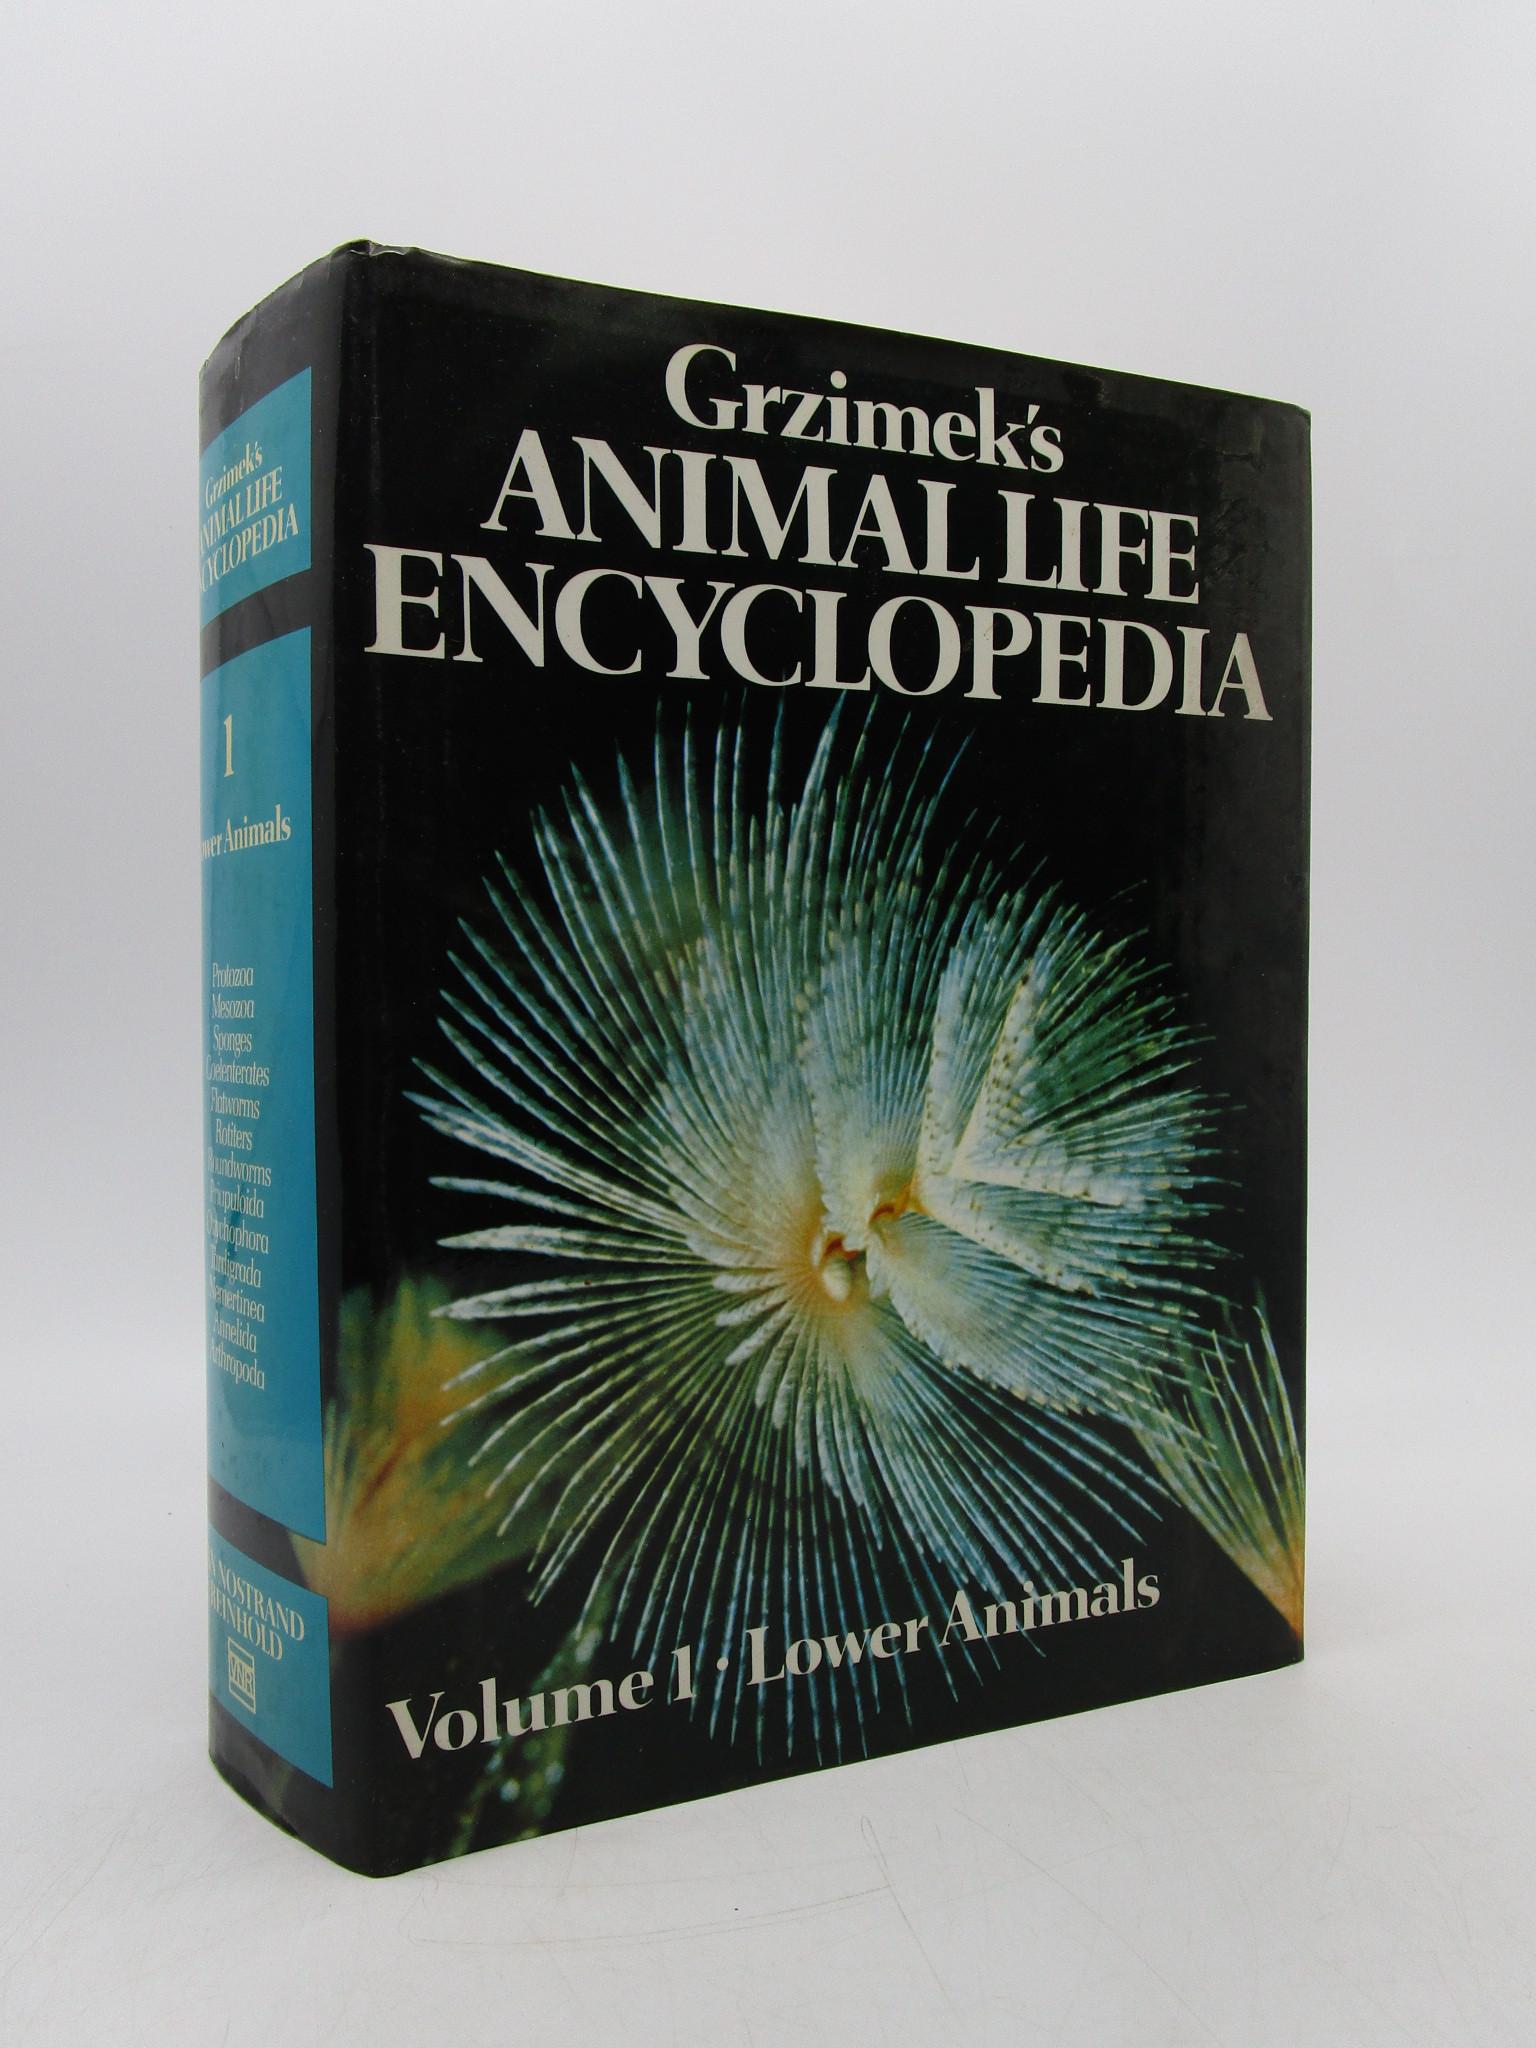 Image for Grzimek's Animal Life Encyclopedia, Volume 1, Lower Animals